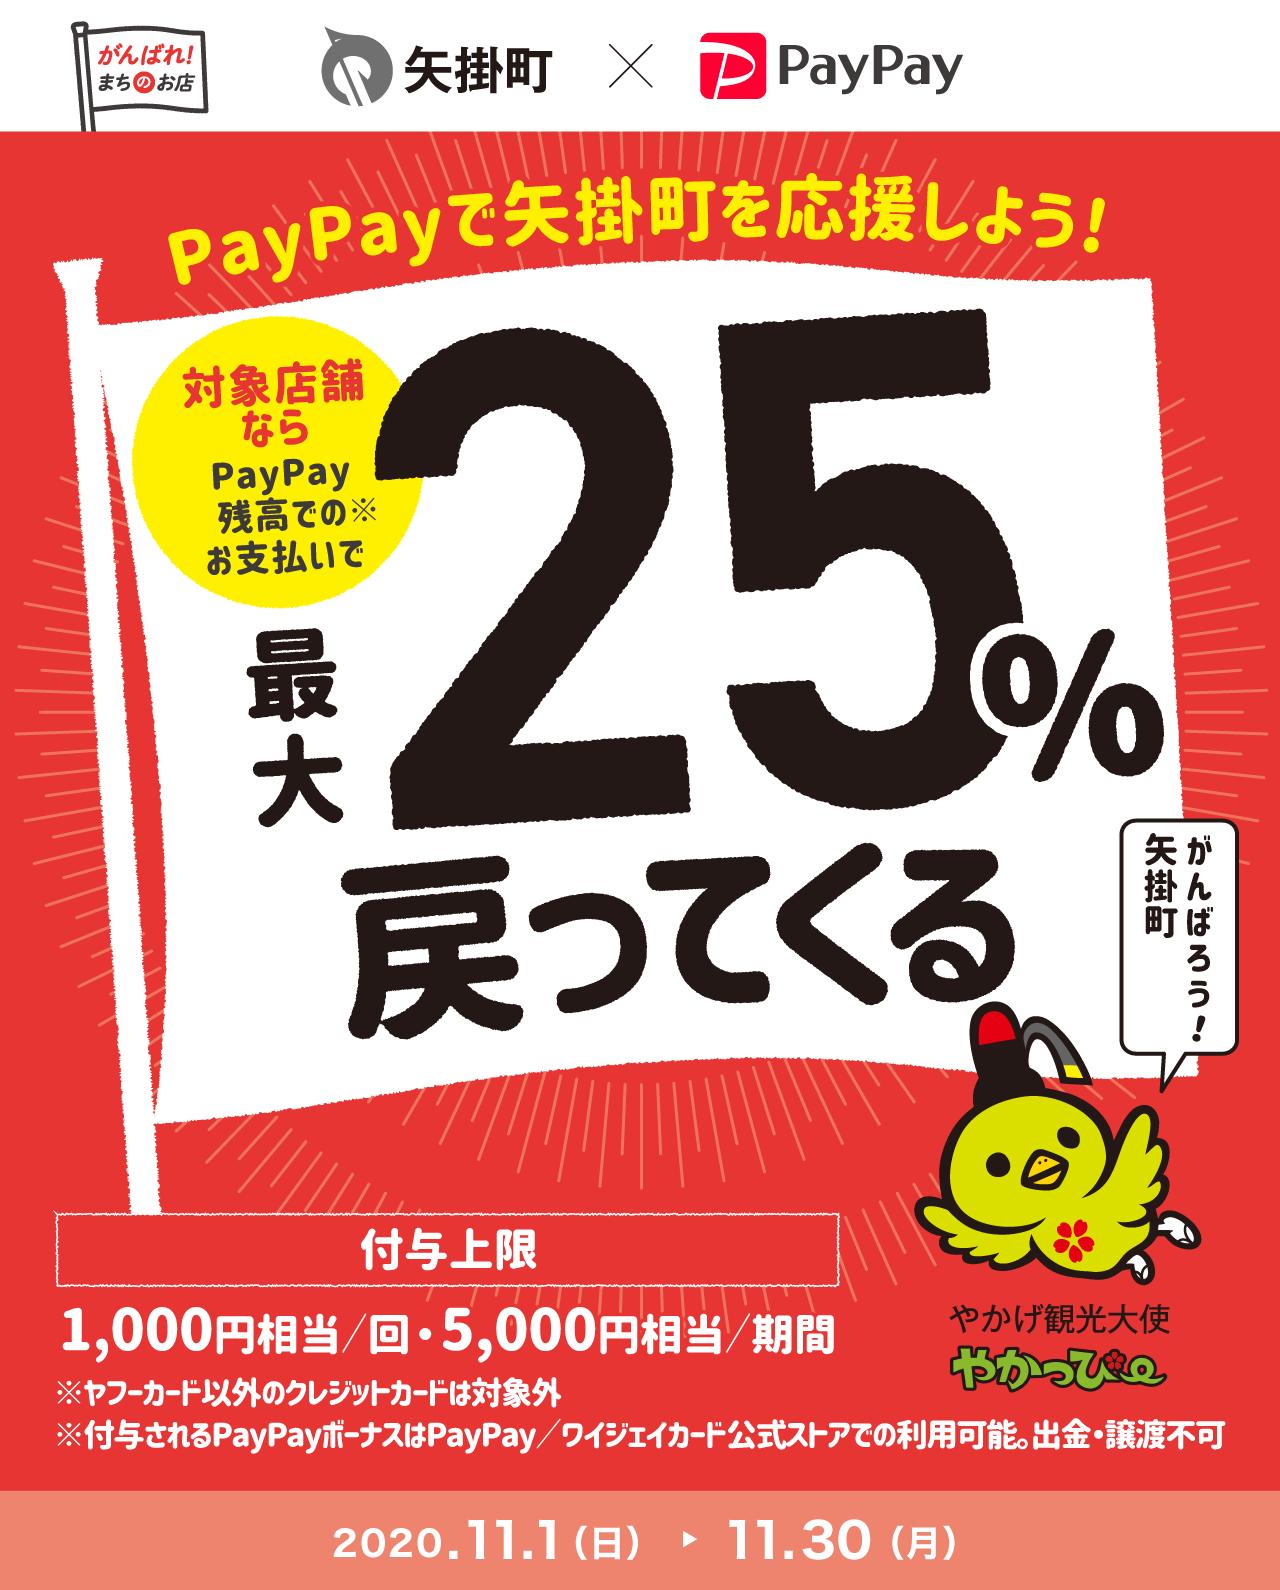 PayPayで矢掛町を応援しよう! 対象店舗ならPayPay残高でのお支払いで最大25%戻ってくる